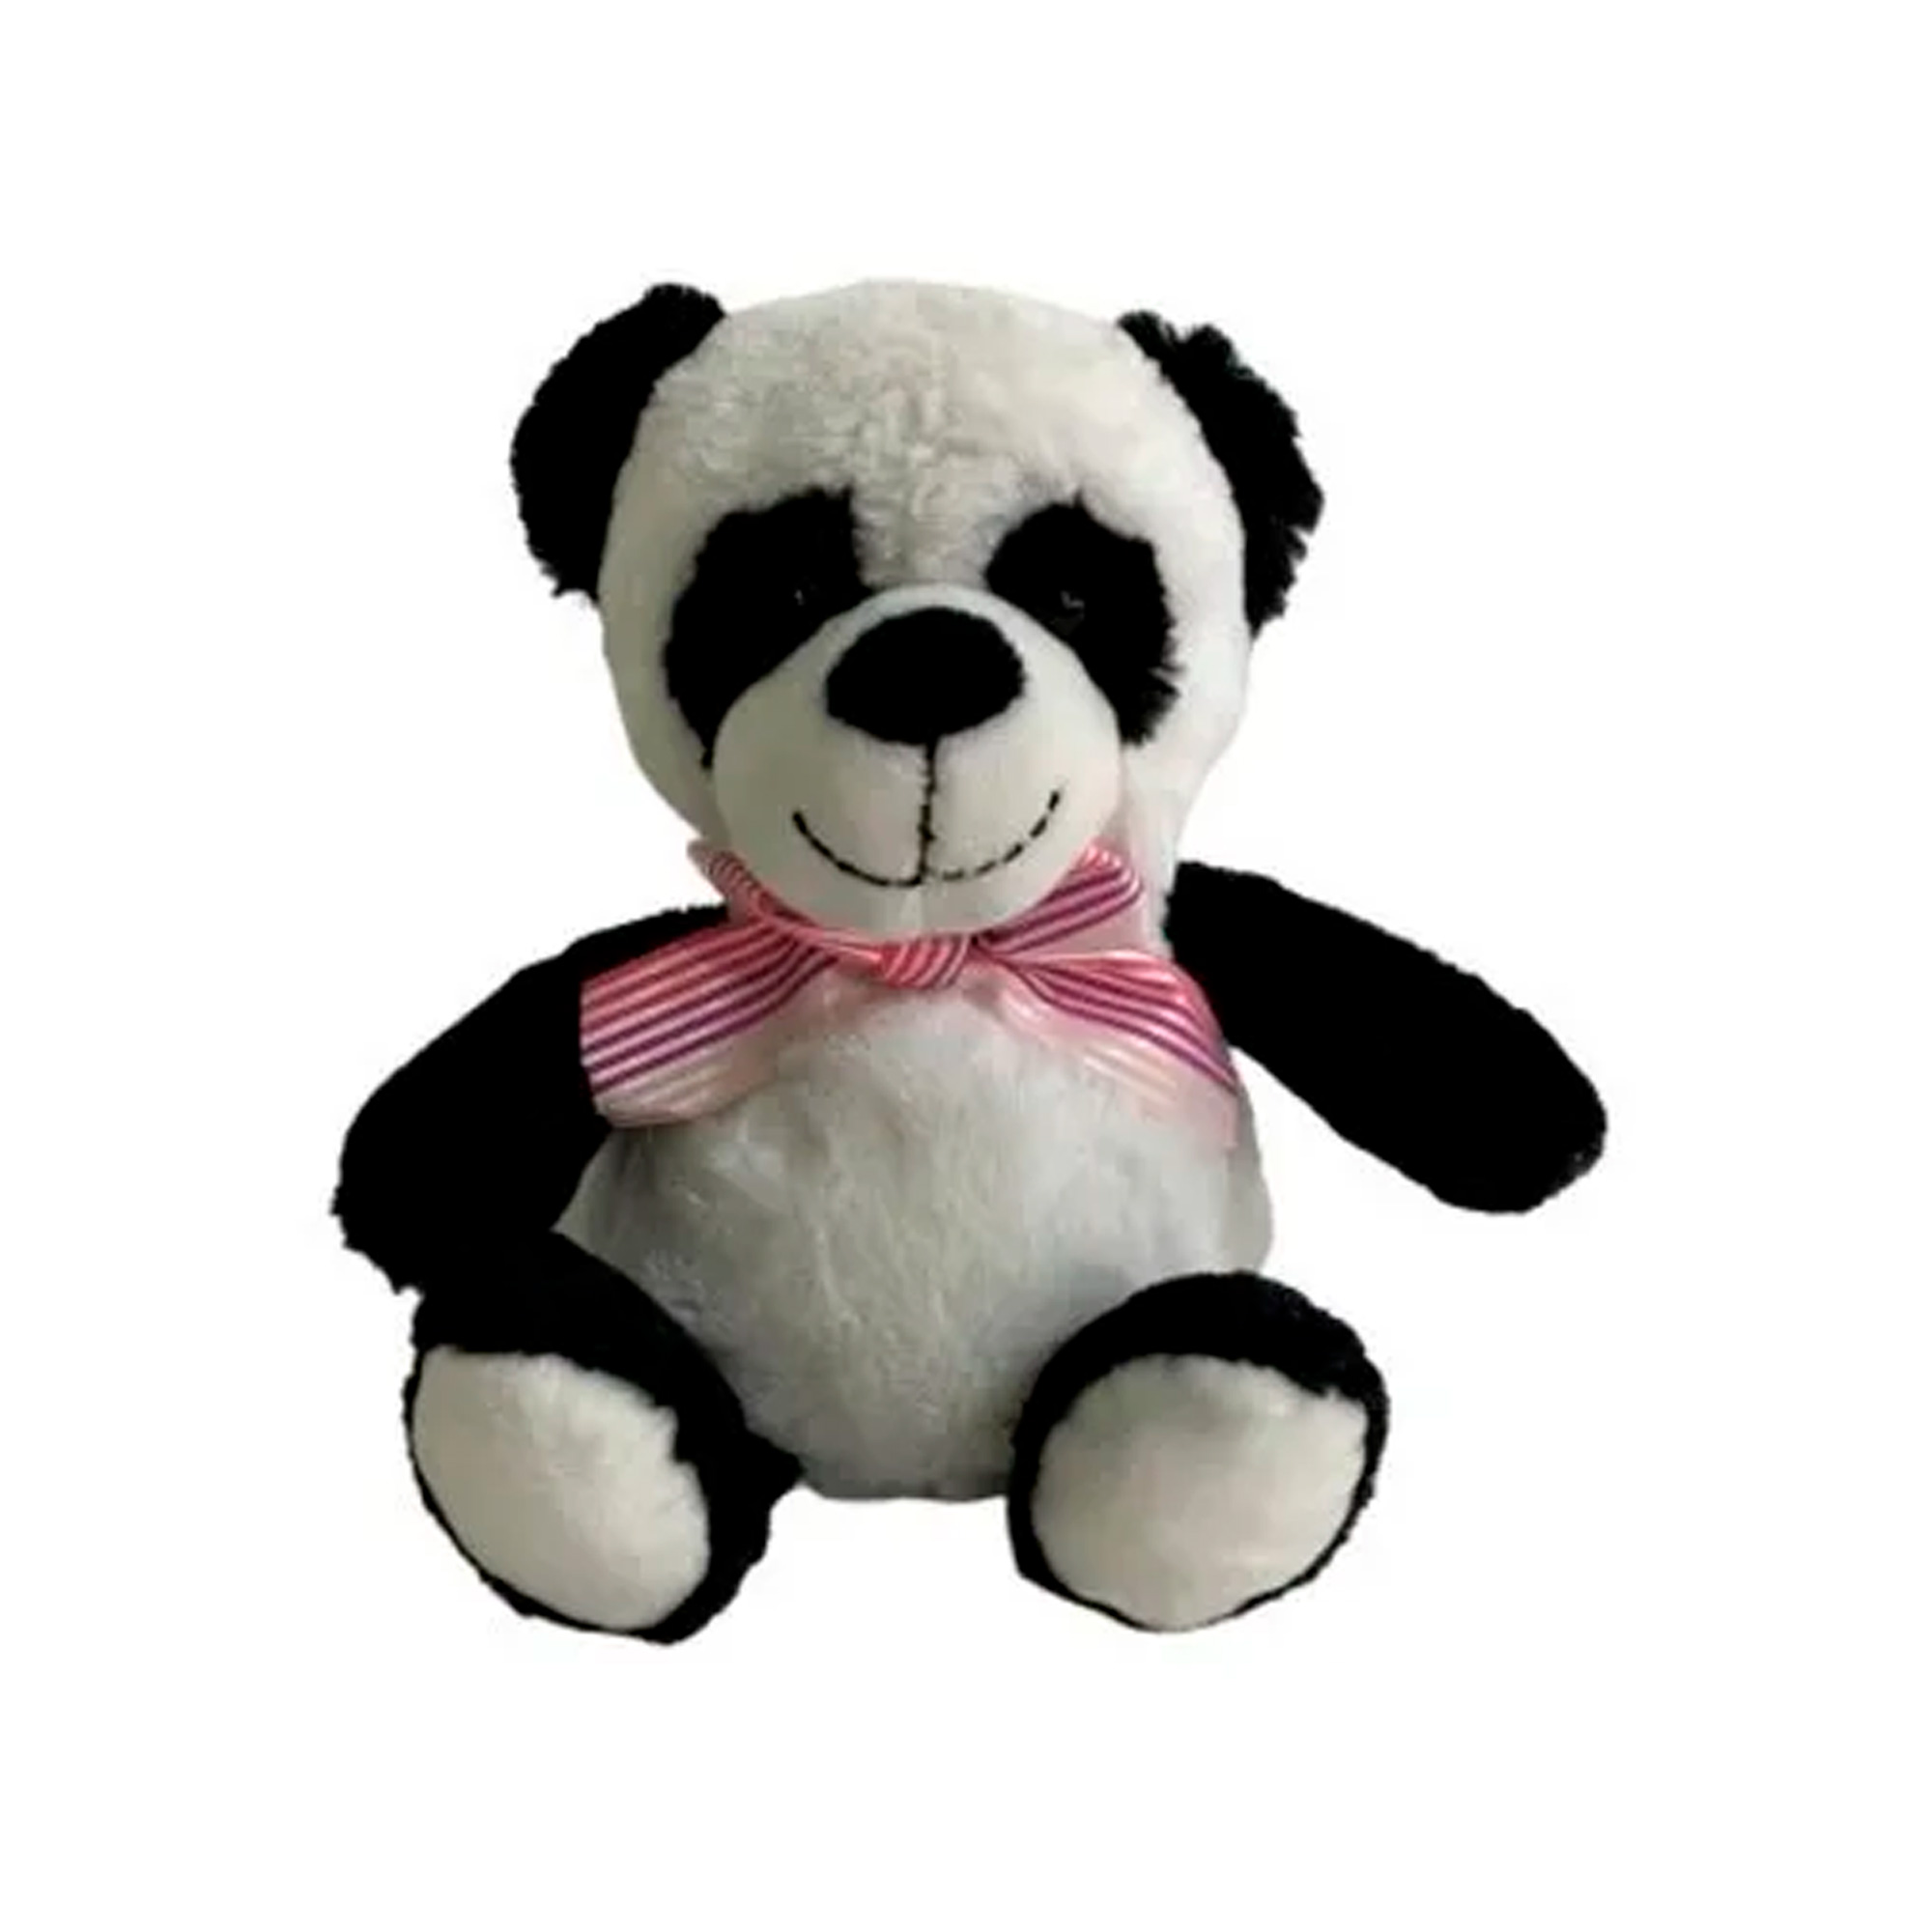 Panda de Pelúcia 19cm Sentado